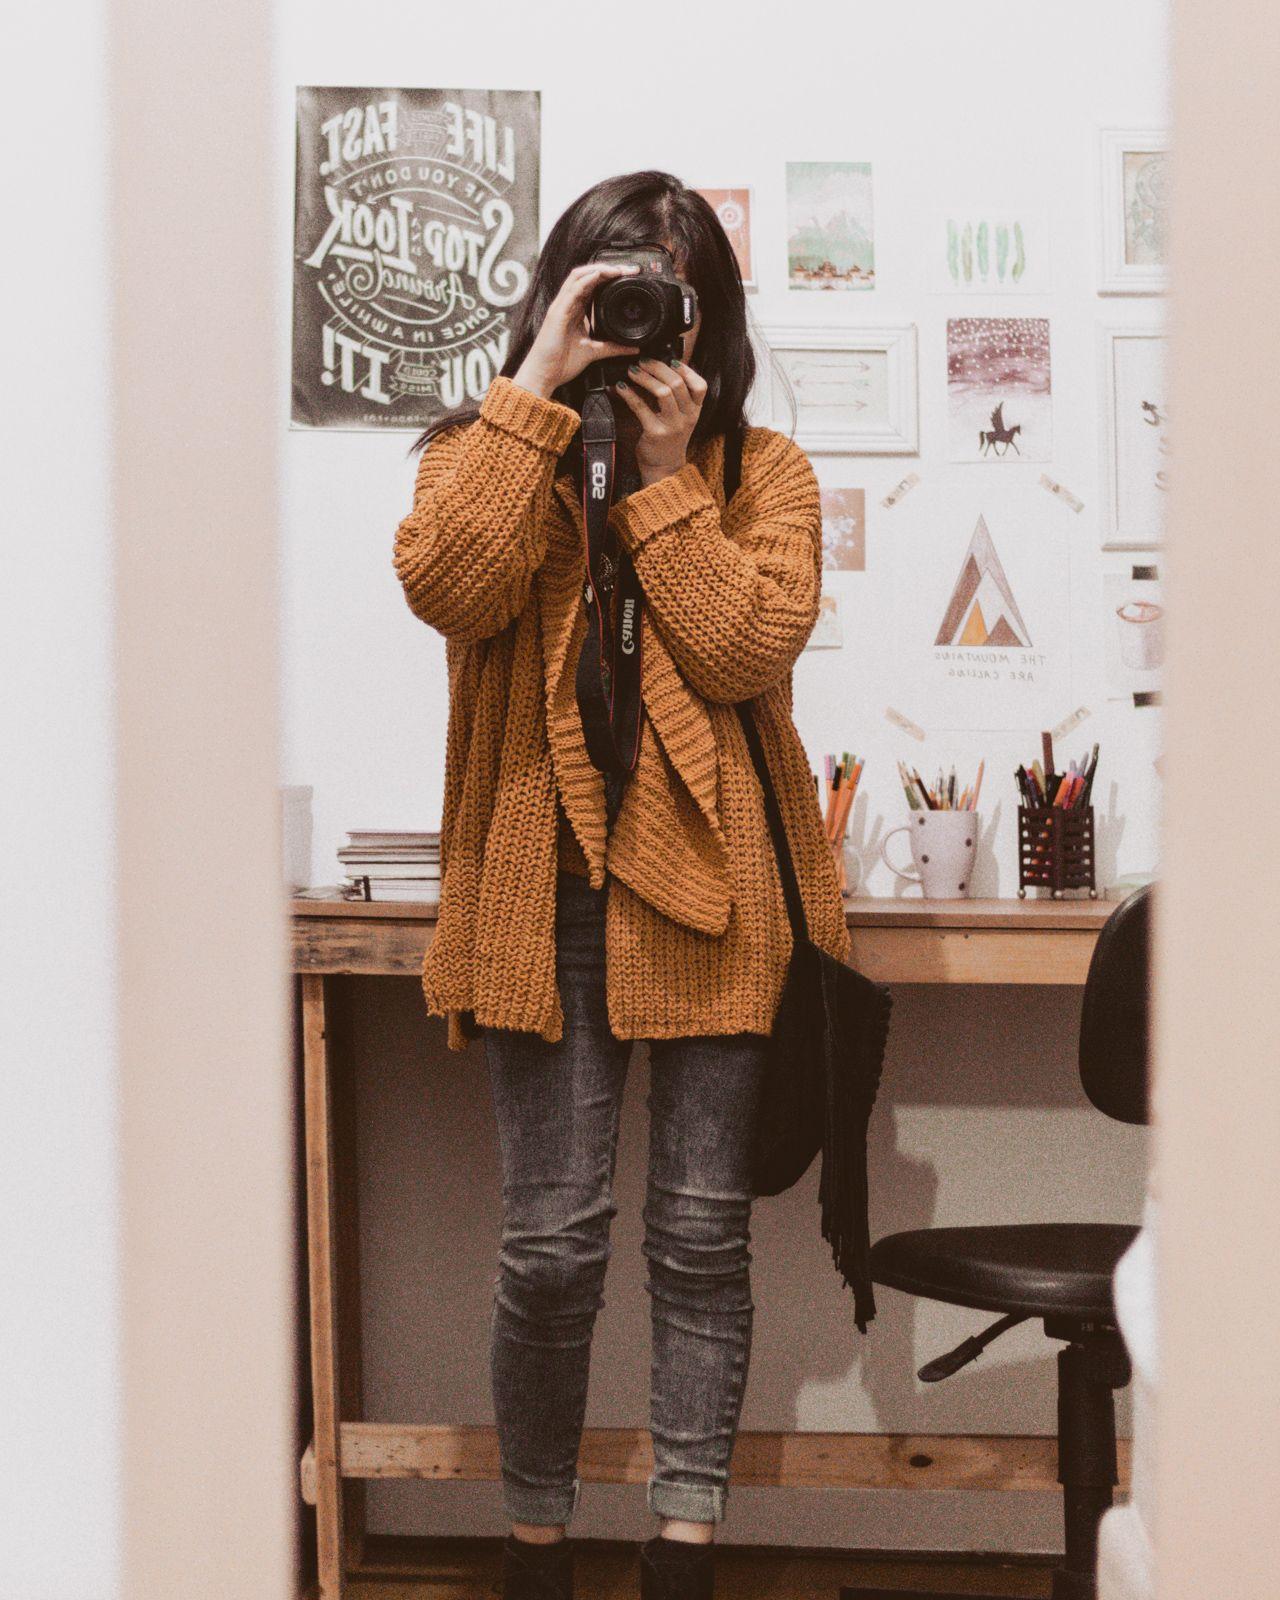 SNAPSHOTS #3 + Life Update selfie no espelho